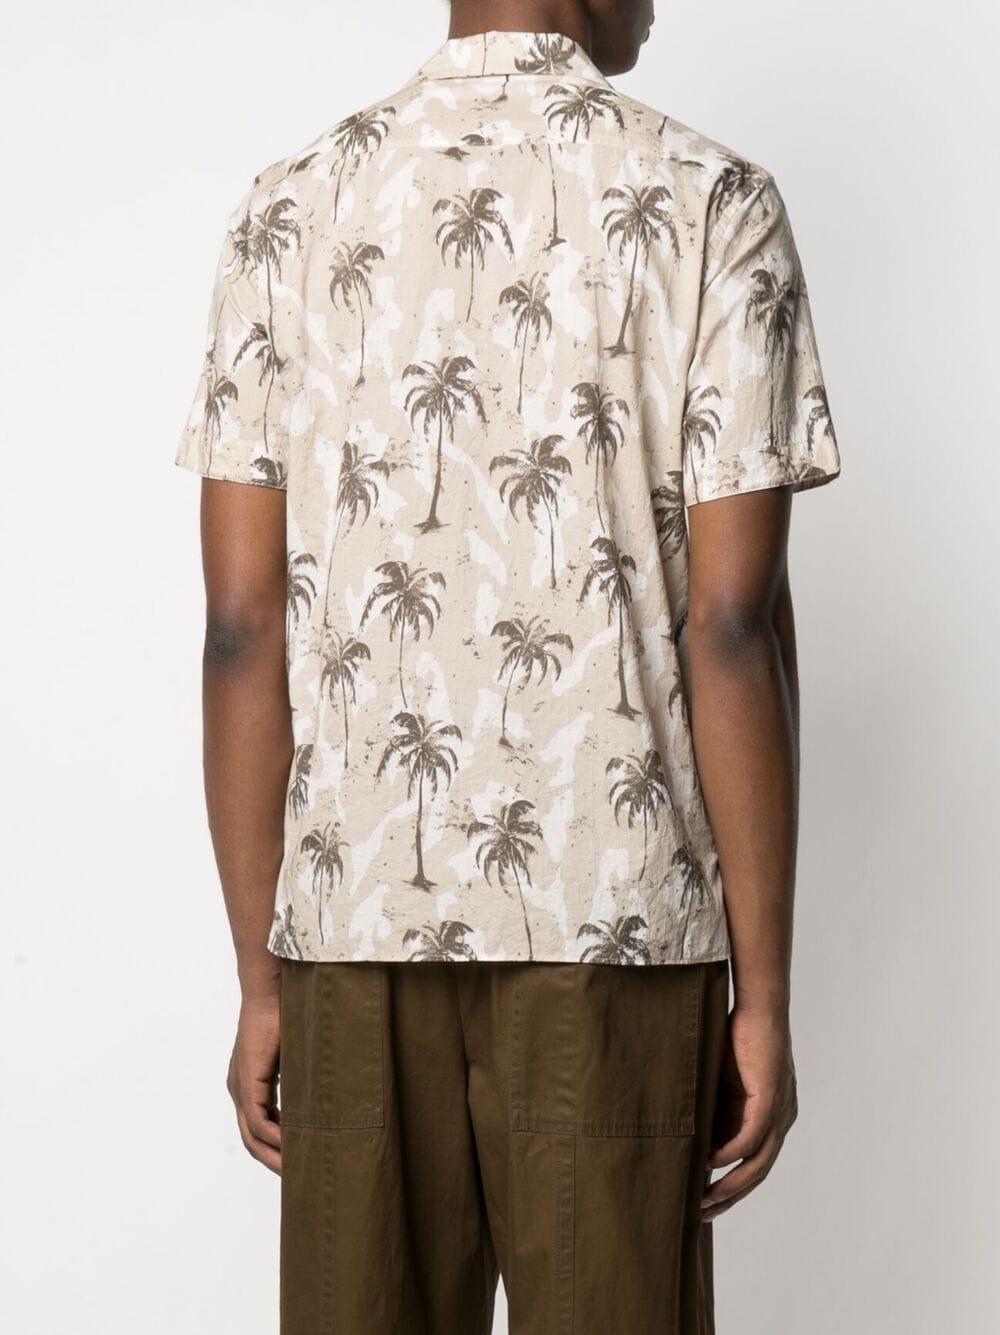 Camicia in stampa palme tropicali in cotone beige e bianco ELEVENTY | Camicie | C75CAMC07-TES0C03702